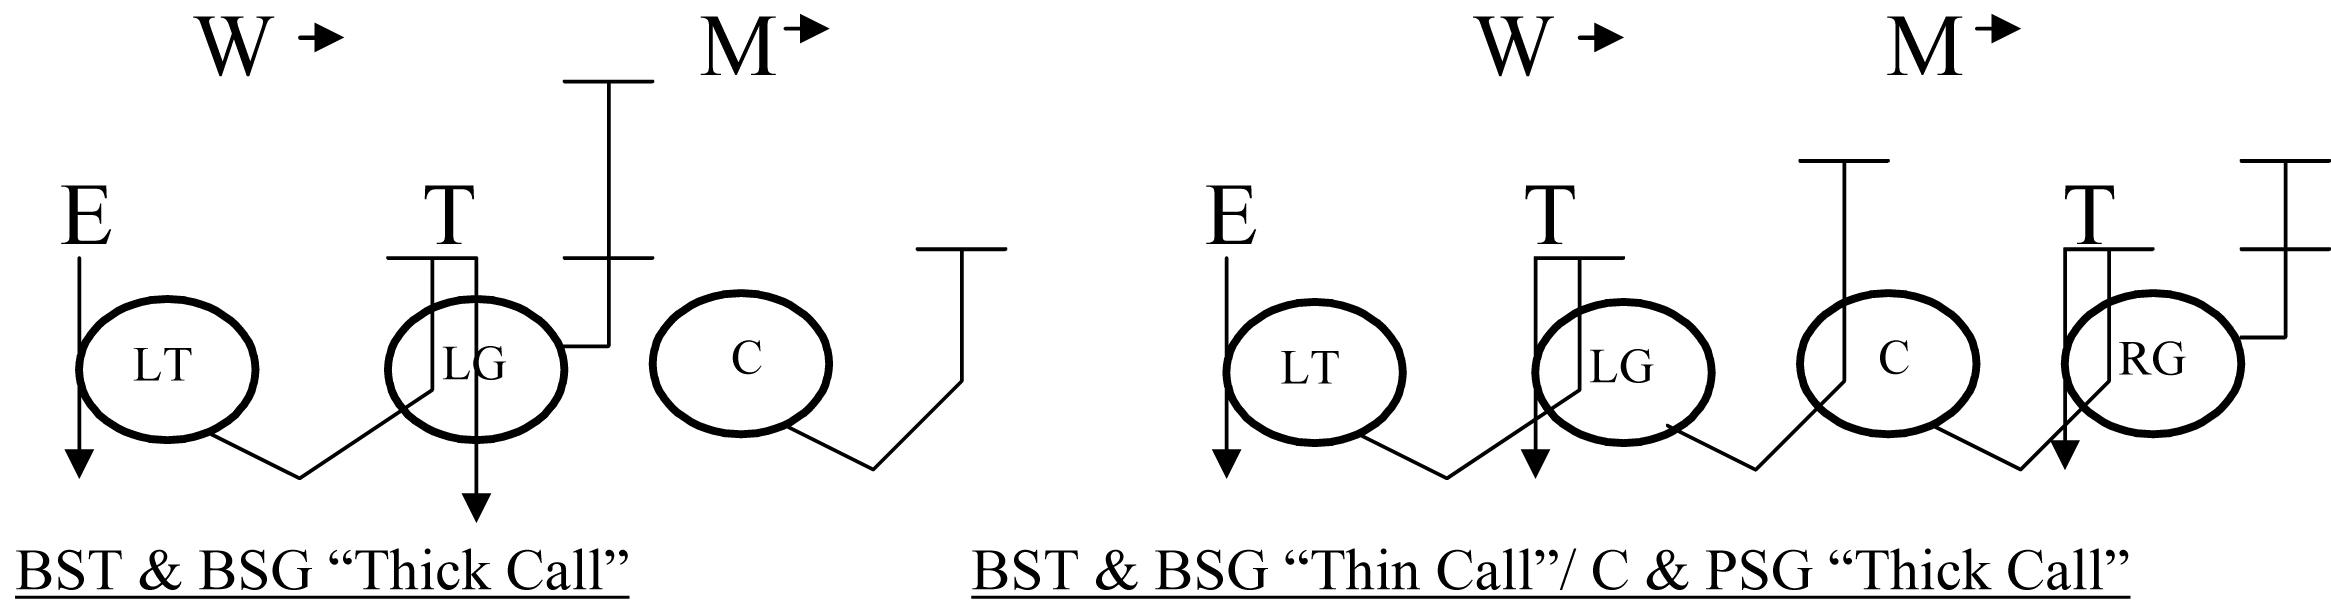 Inside Zone Blocking Diagrams